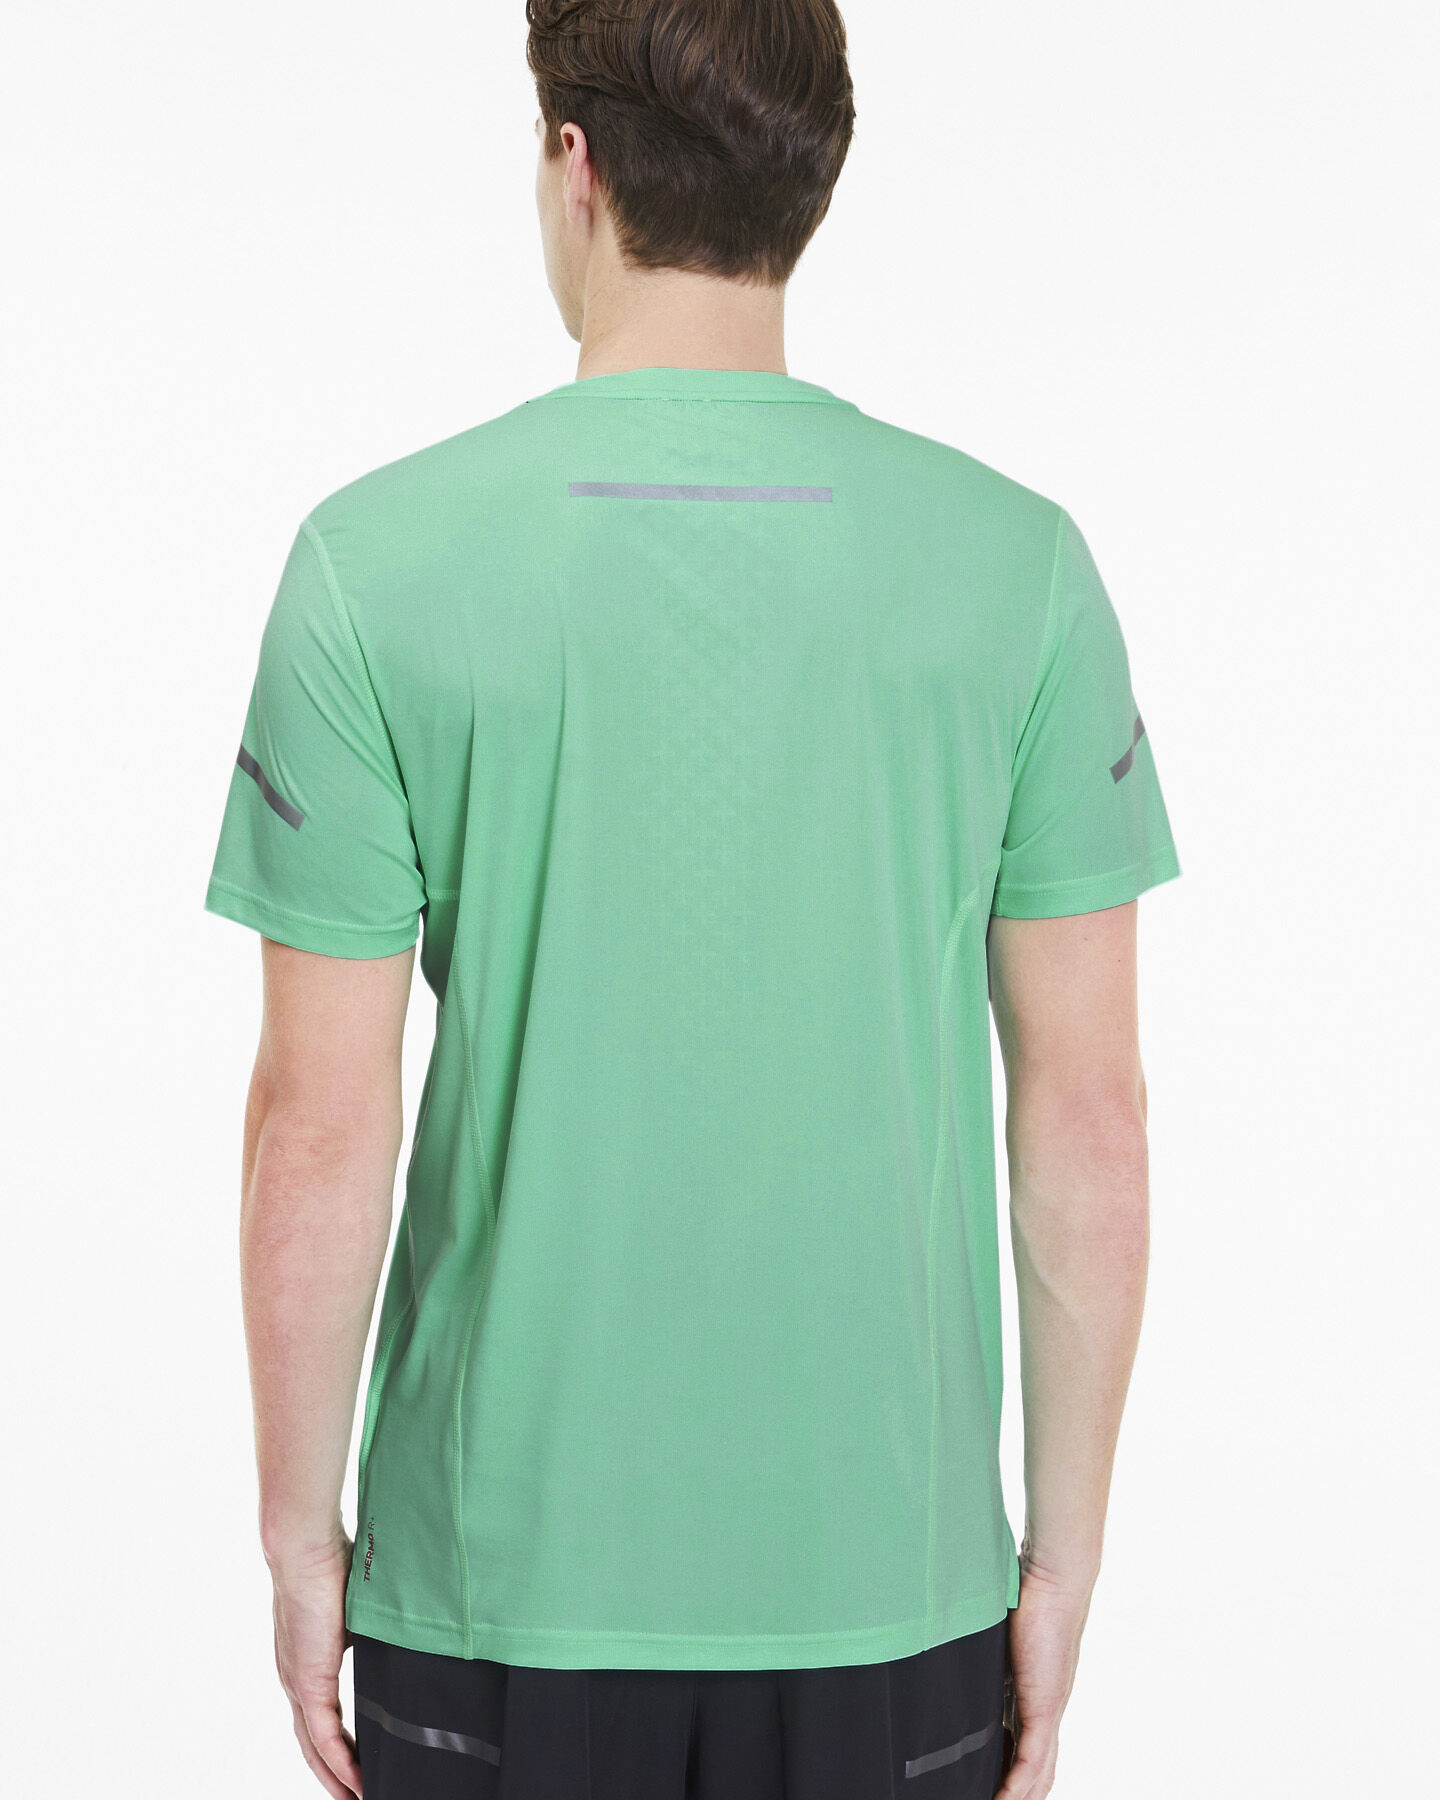 T-Shirt running PUMA BIO MOTION THERMO M S5189108 scatto 3